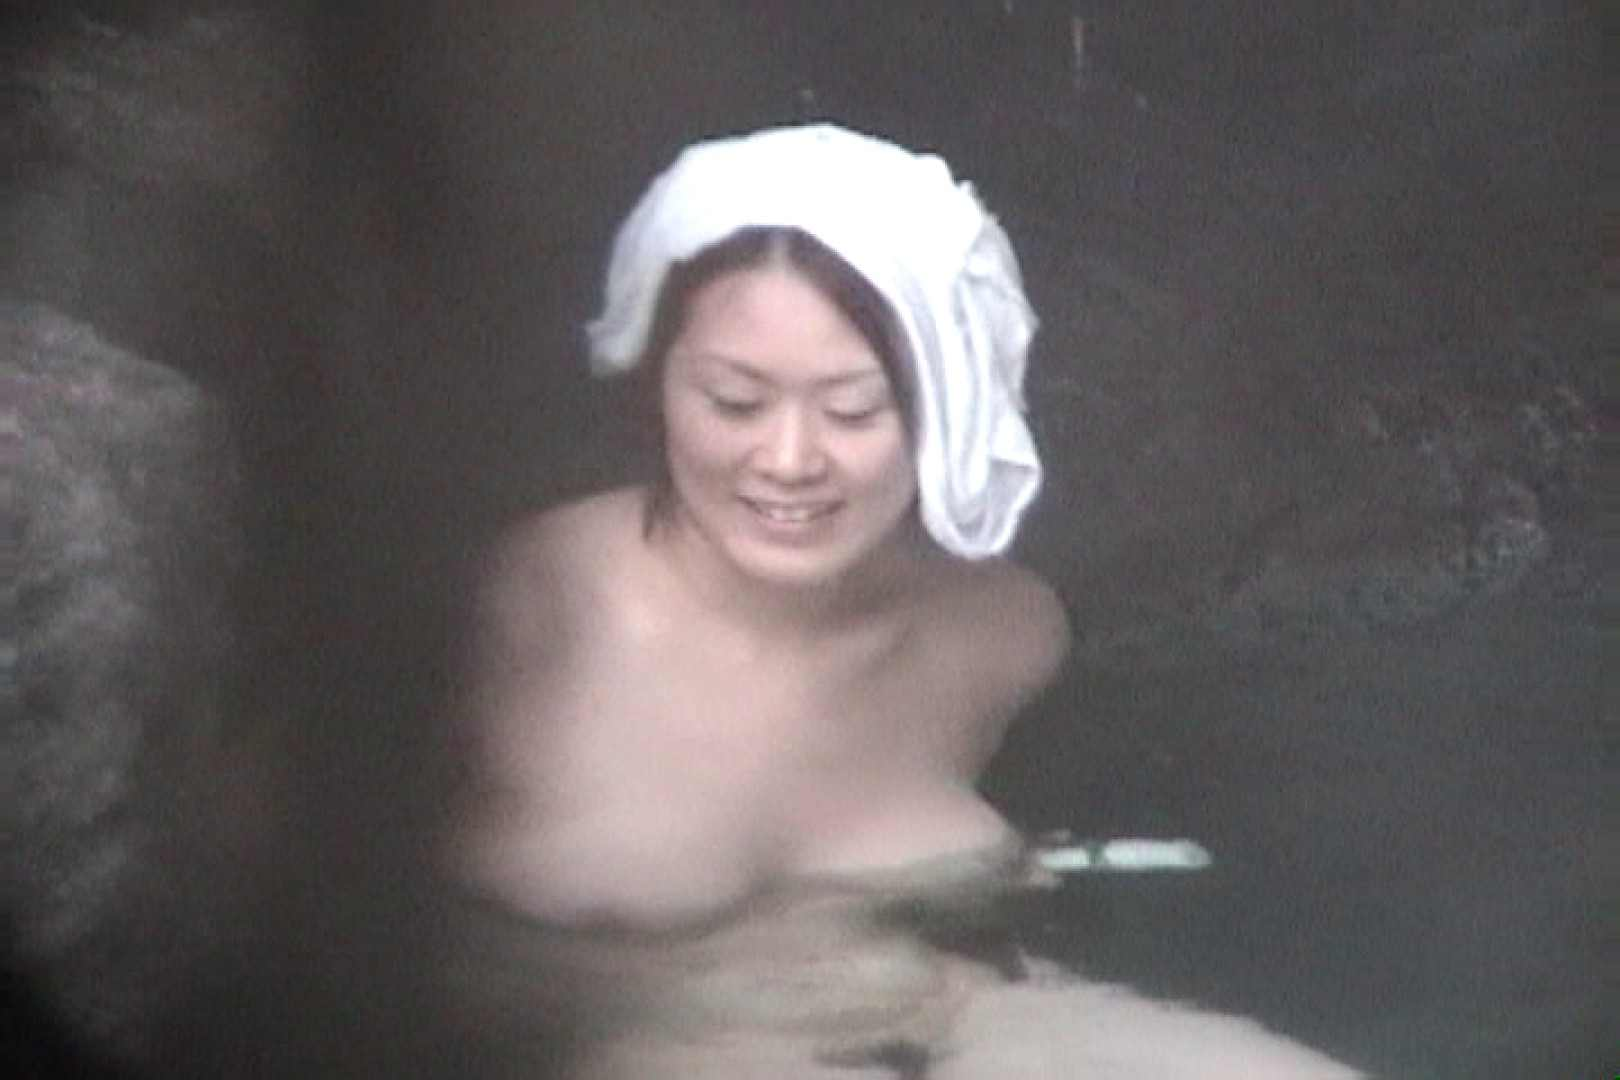 Aquaな露天風呂Vol.71【VIP限定】 綺麗なOLたち | 盗撮  66枚 34